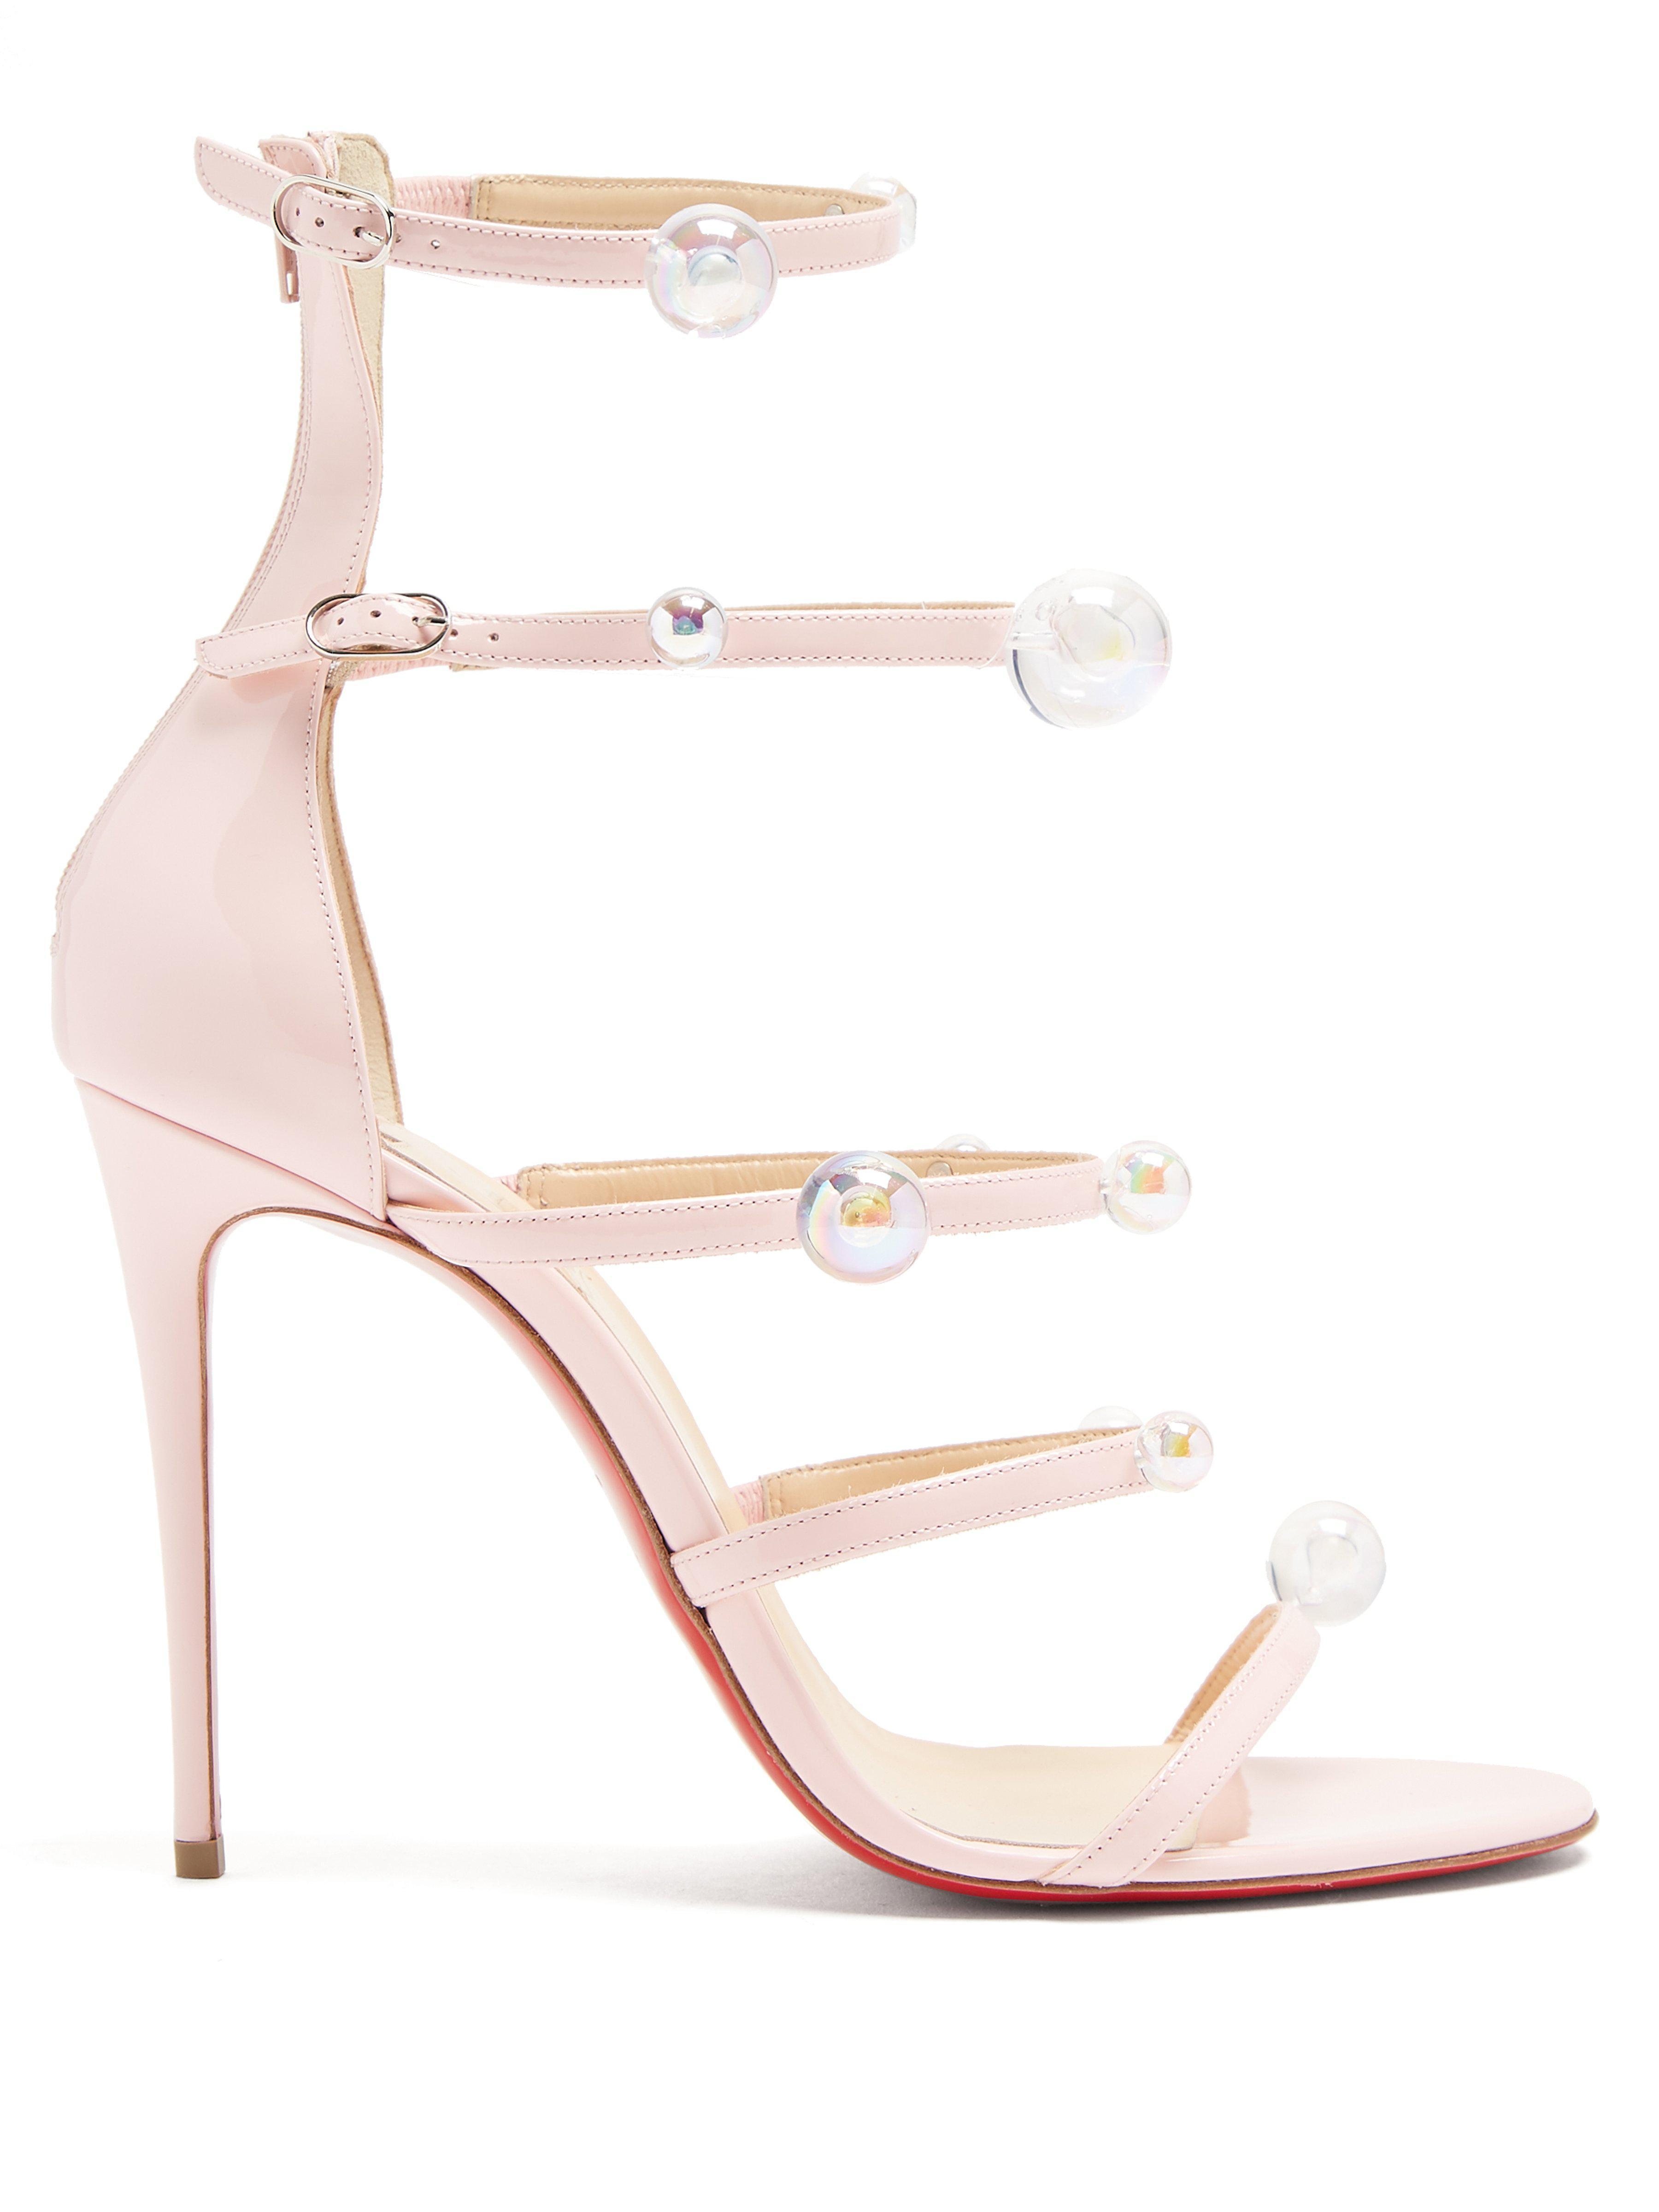 405640e73b48 Christian Louboutin. Women s Pink Antonana 100 Patent Leather Sandals